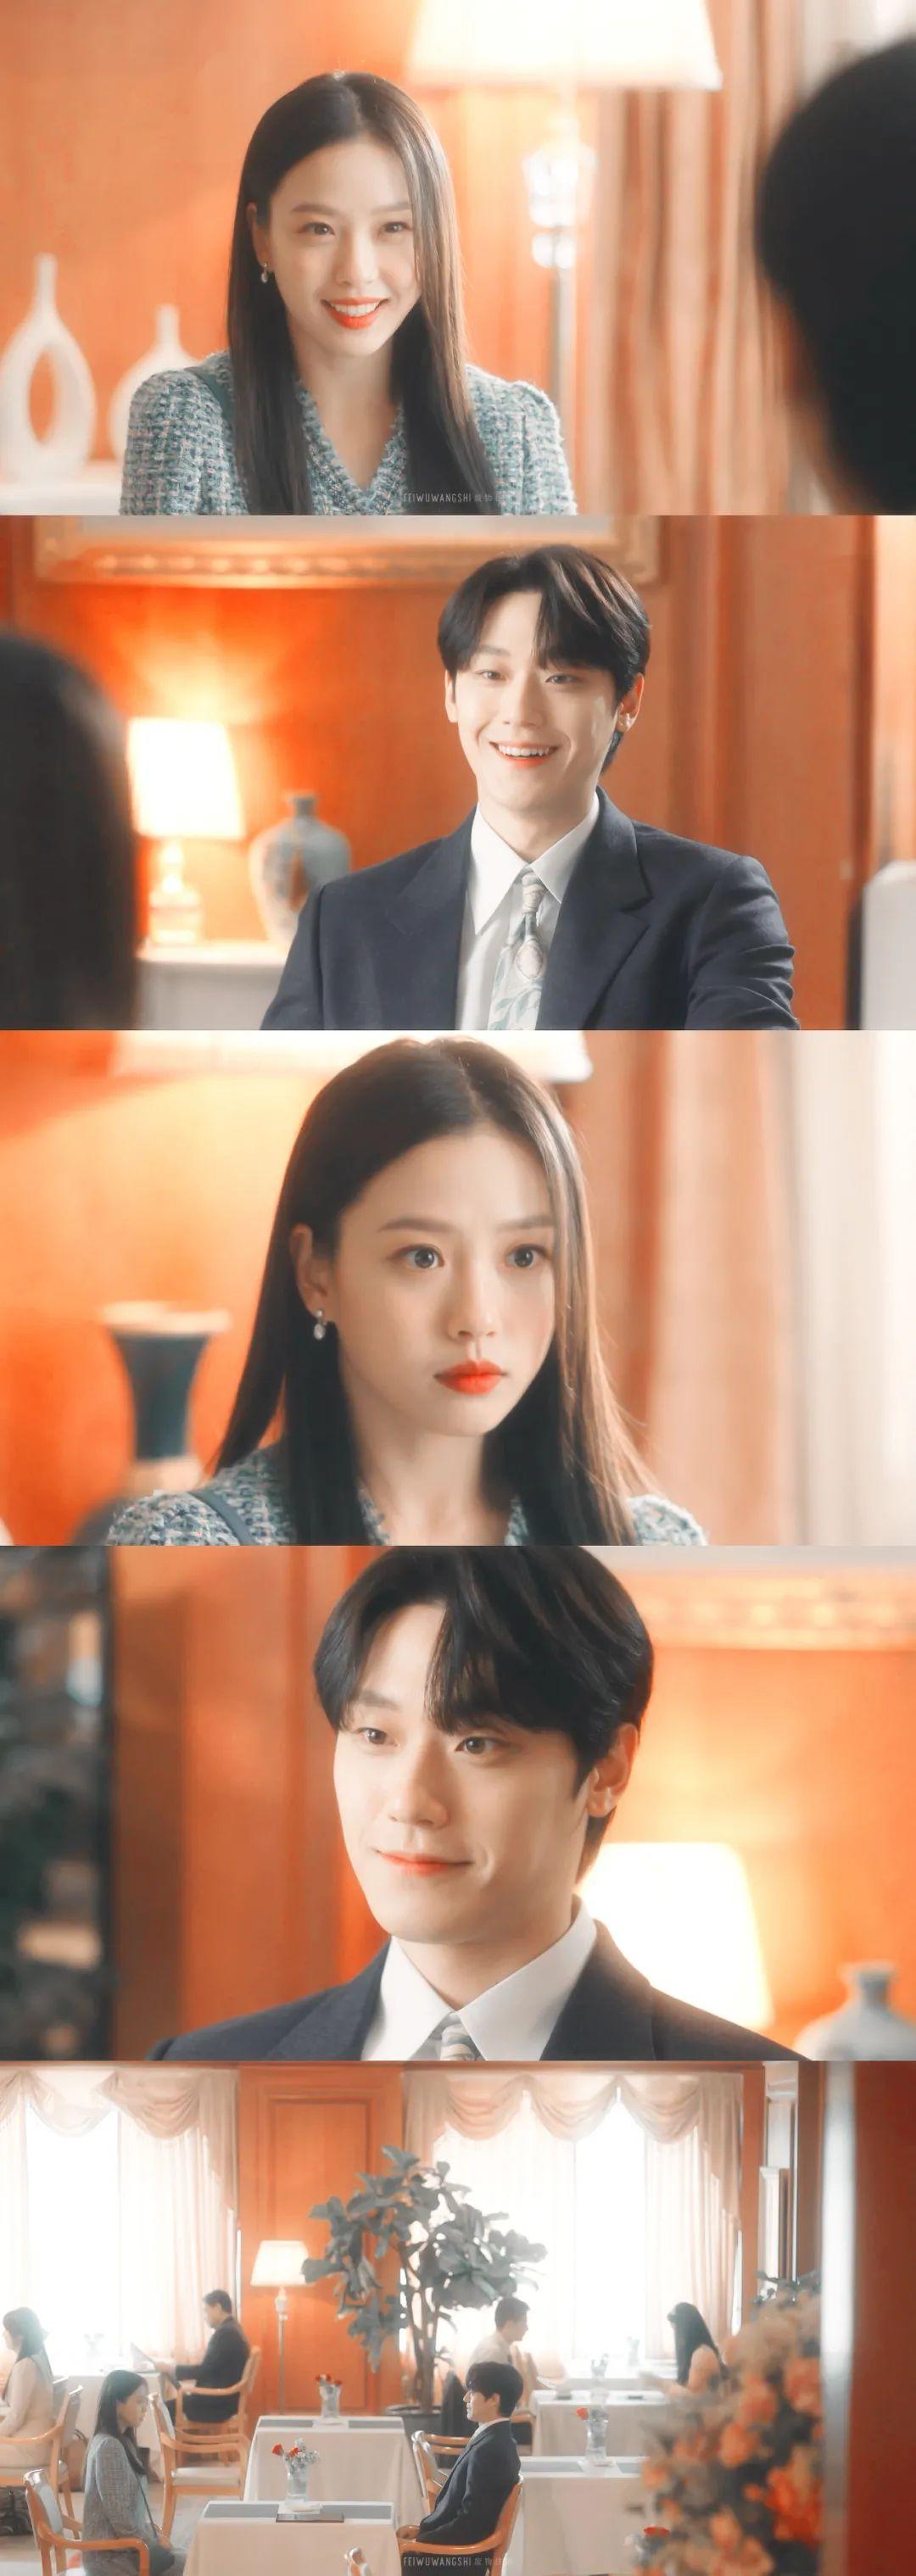 Face bump Kim min hee Korean drama atmosphere beauty + 1插图